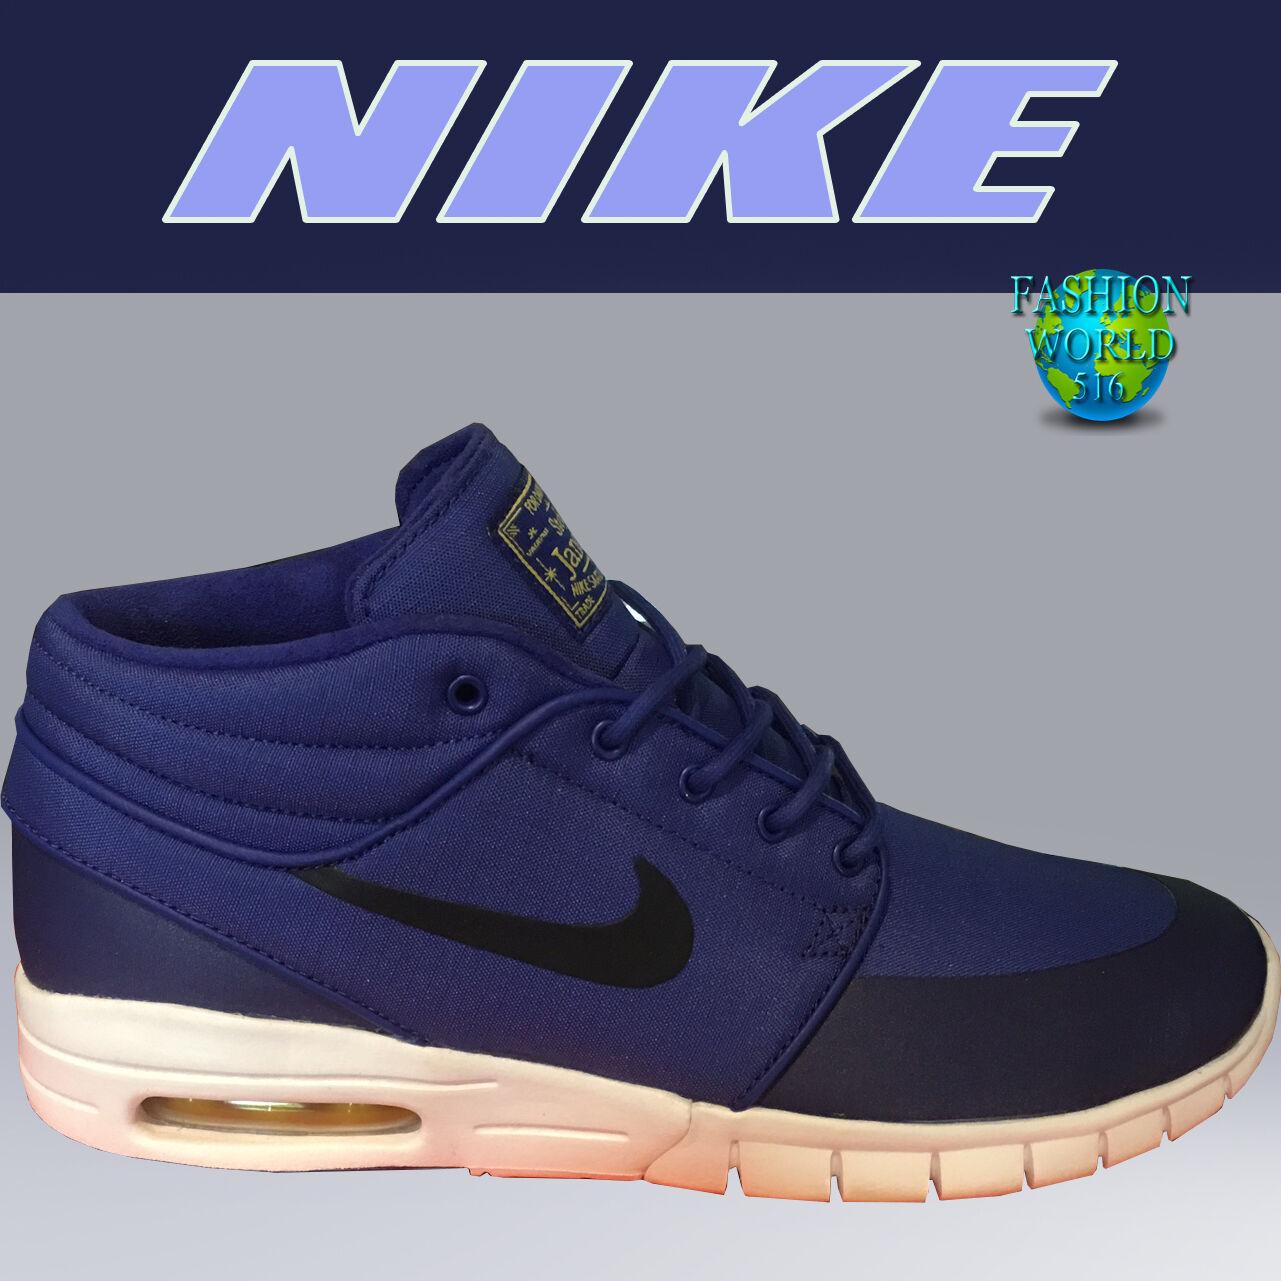 nike 9 taille 9 nike sb stefan janoski hommes mi - chaussures de max 807507 507 bleu royal / marine b64d02